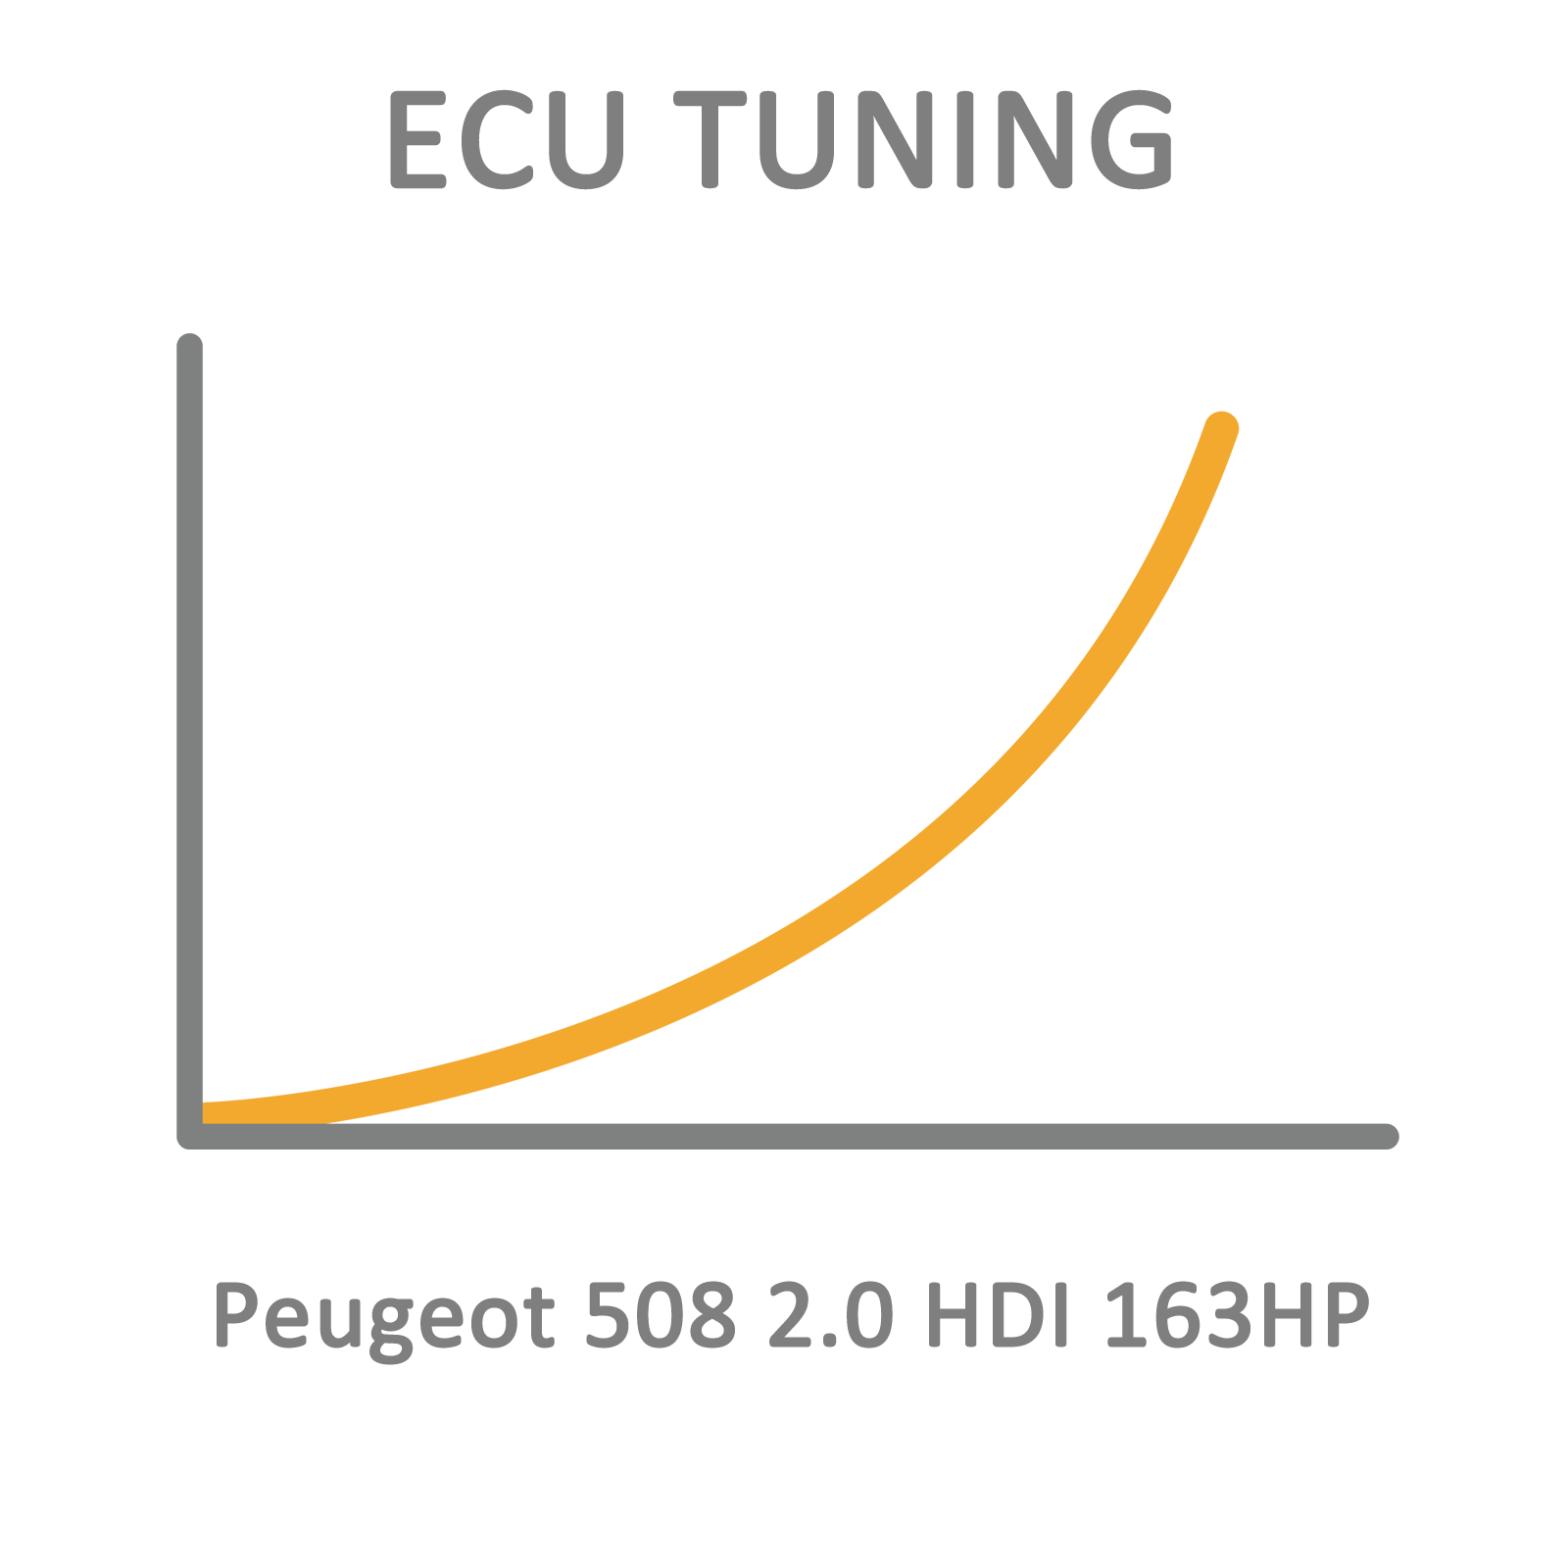 Peugeot 508 2.0 HDI 163HP ECU Tuning Remapping Programming